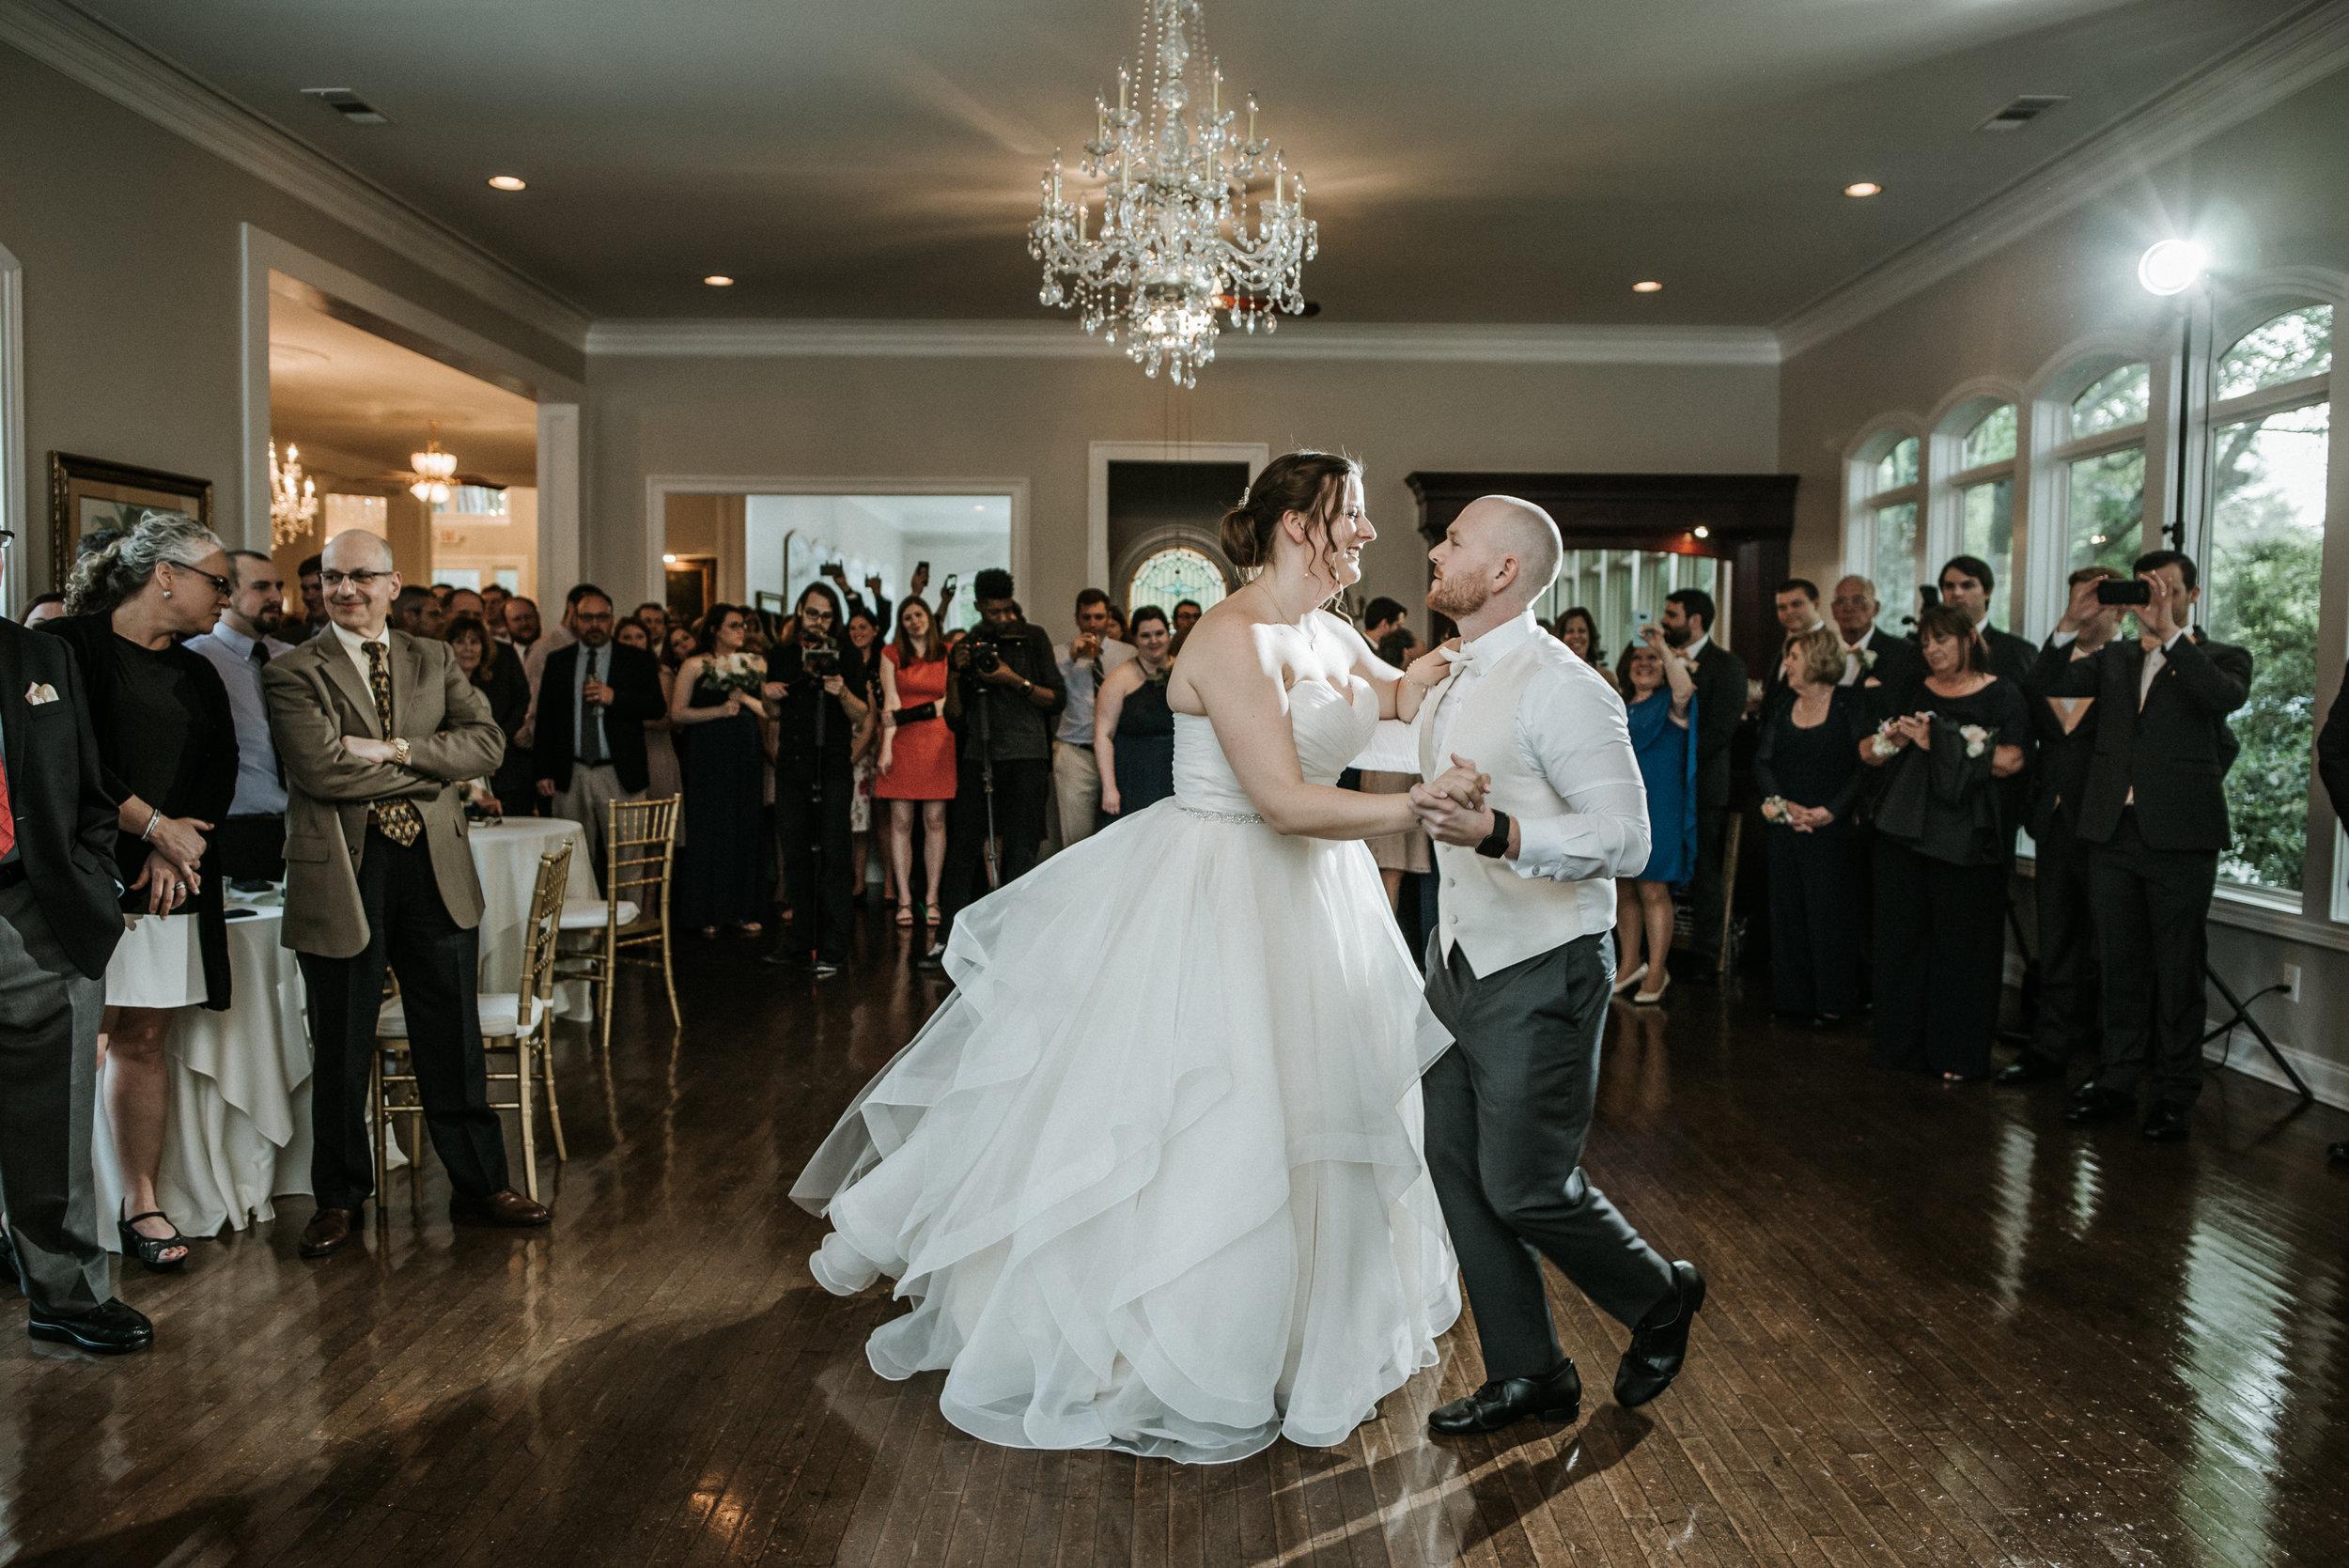 KrisandraEvans.com | Atlanta Wedding Photographer | Florida Wedding Photographer